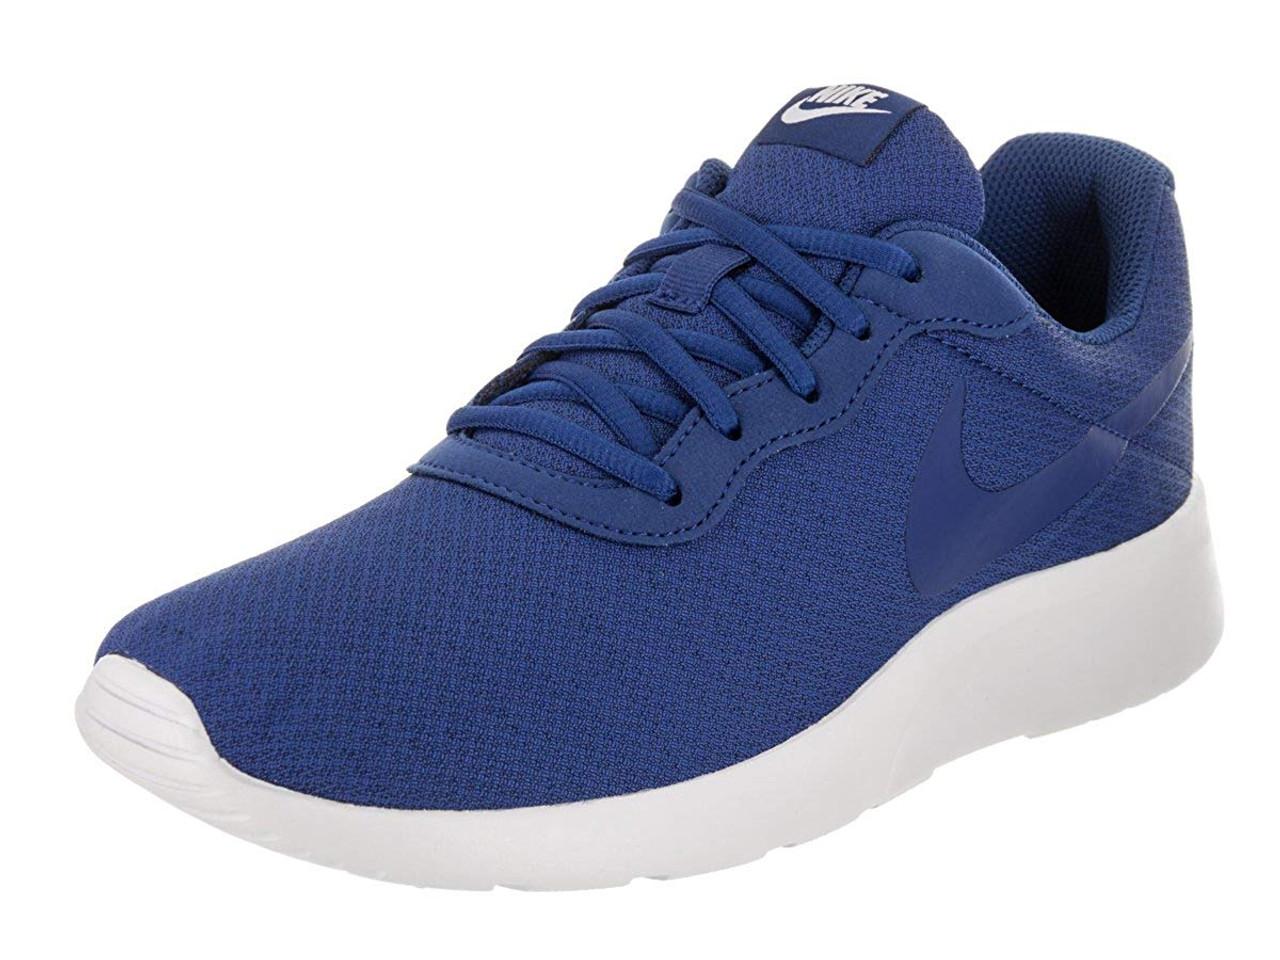 e7c6da45f8c8e Nike Mens 812654 Fabric Low Top Lace Up Running Sneaker~pp-eb41240c